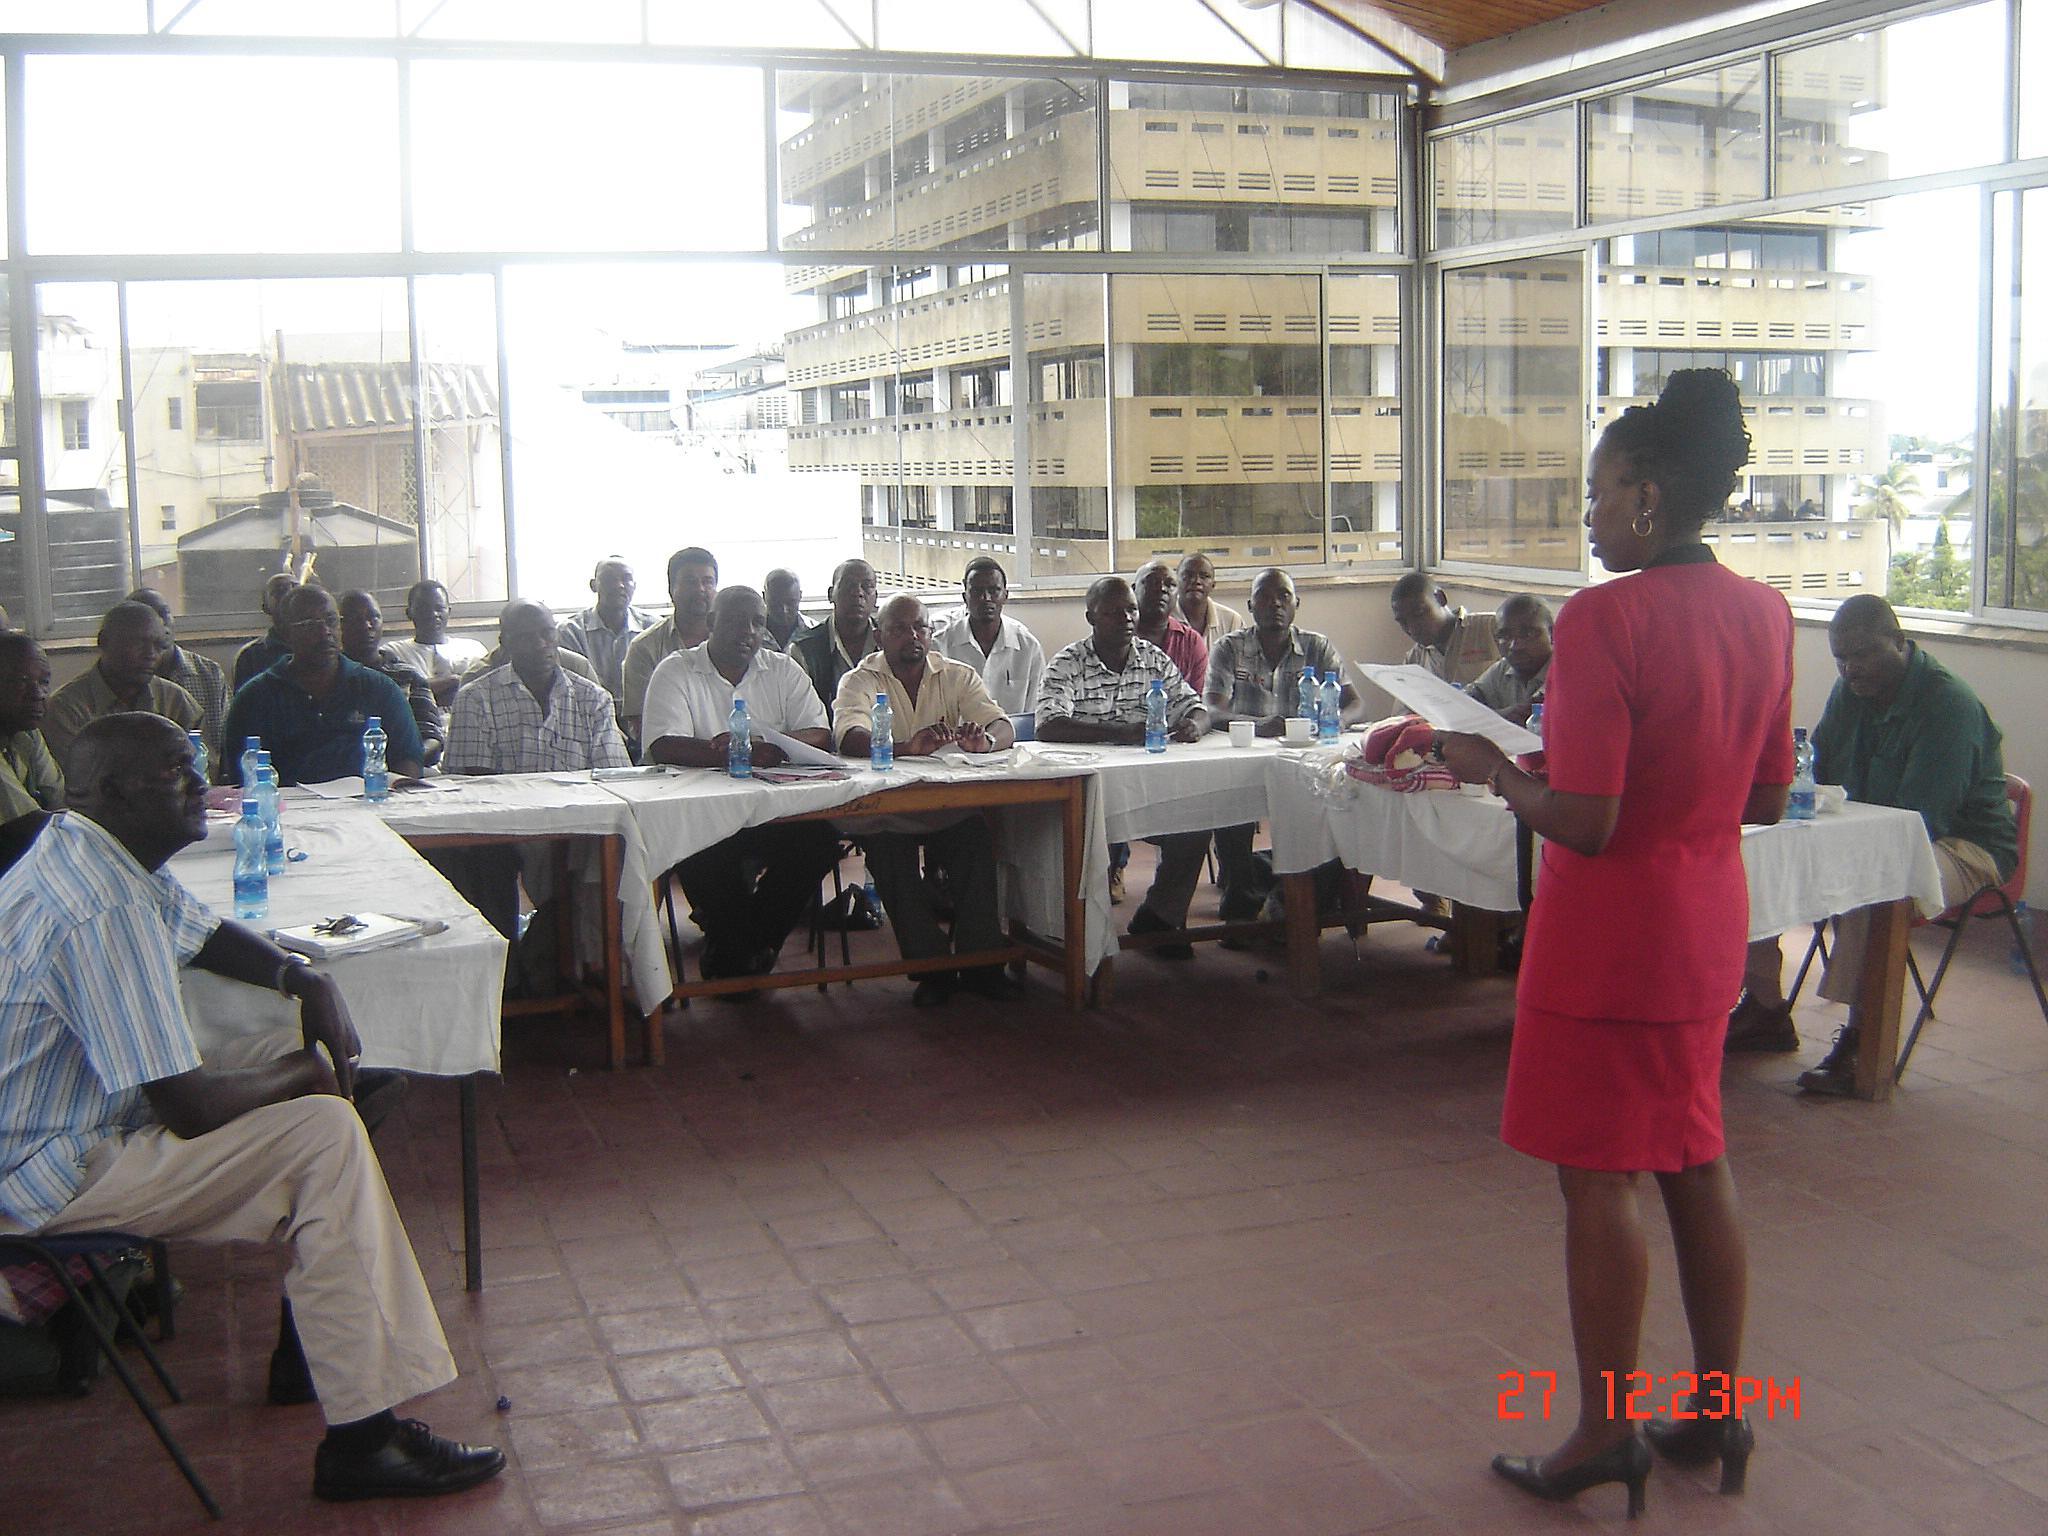 comp_kato-first-aid-2010-susan